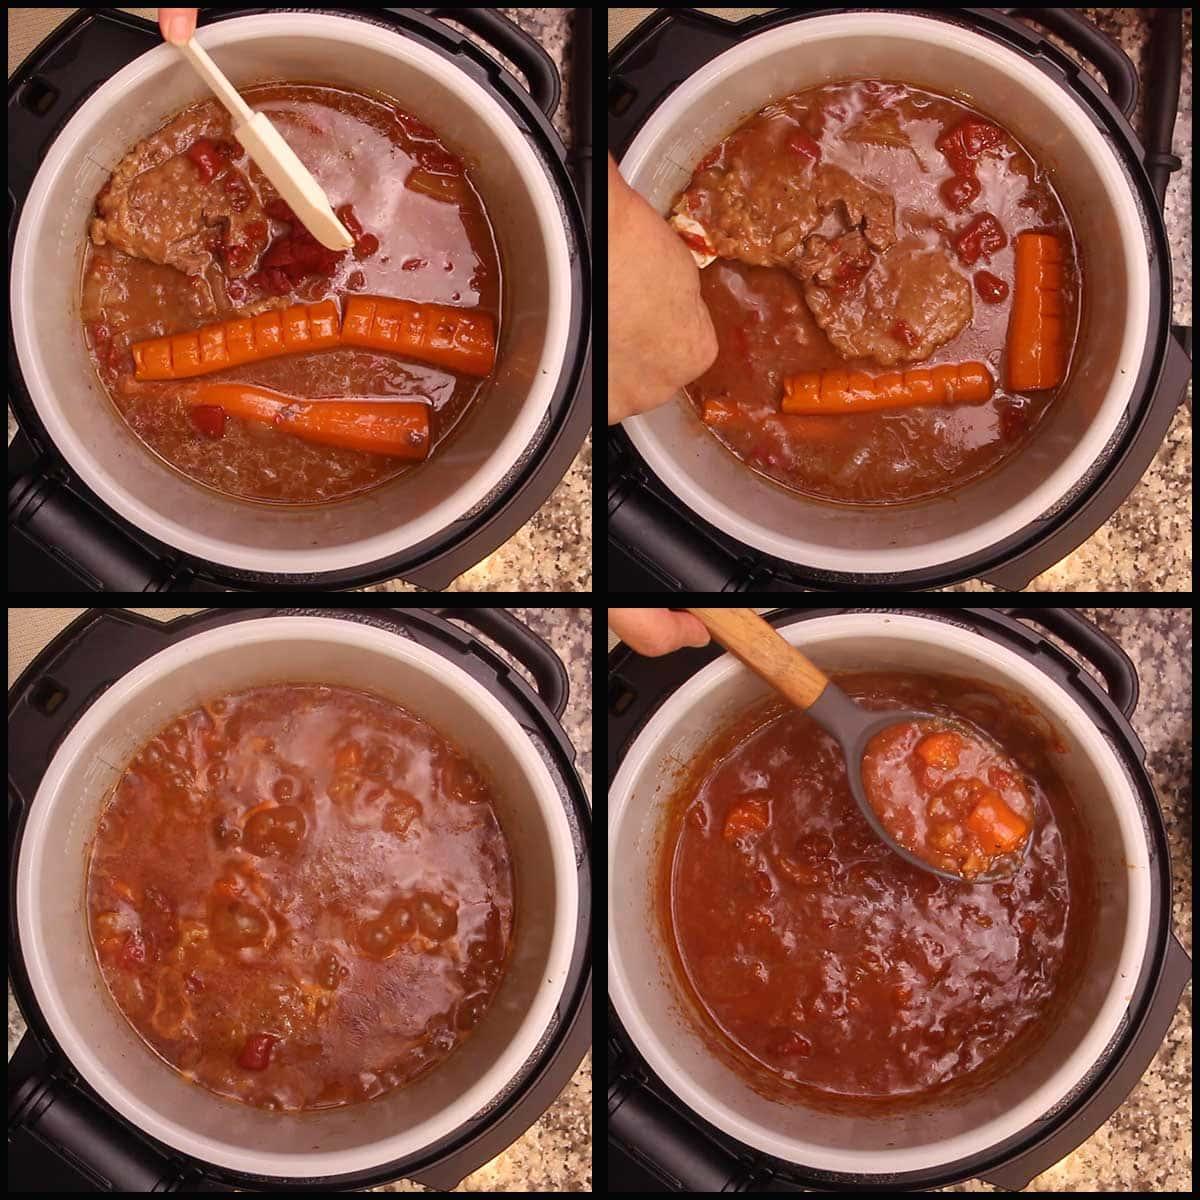 Thickening the tomato gravy for swiss steak